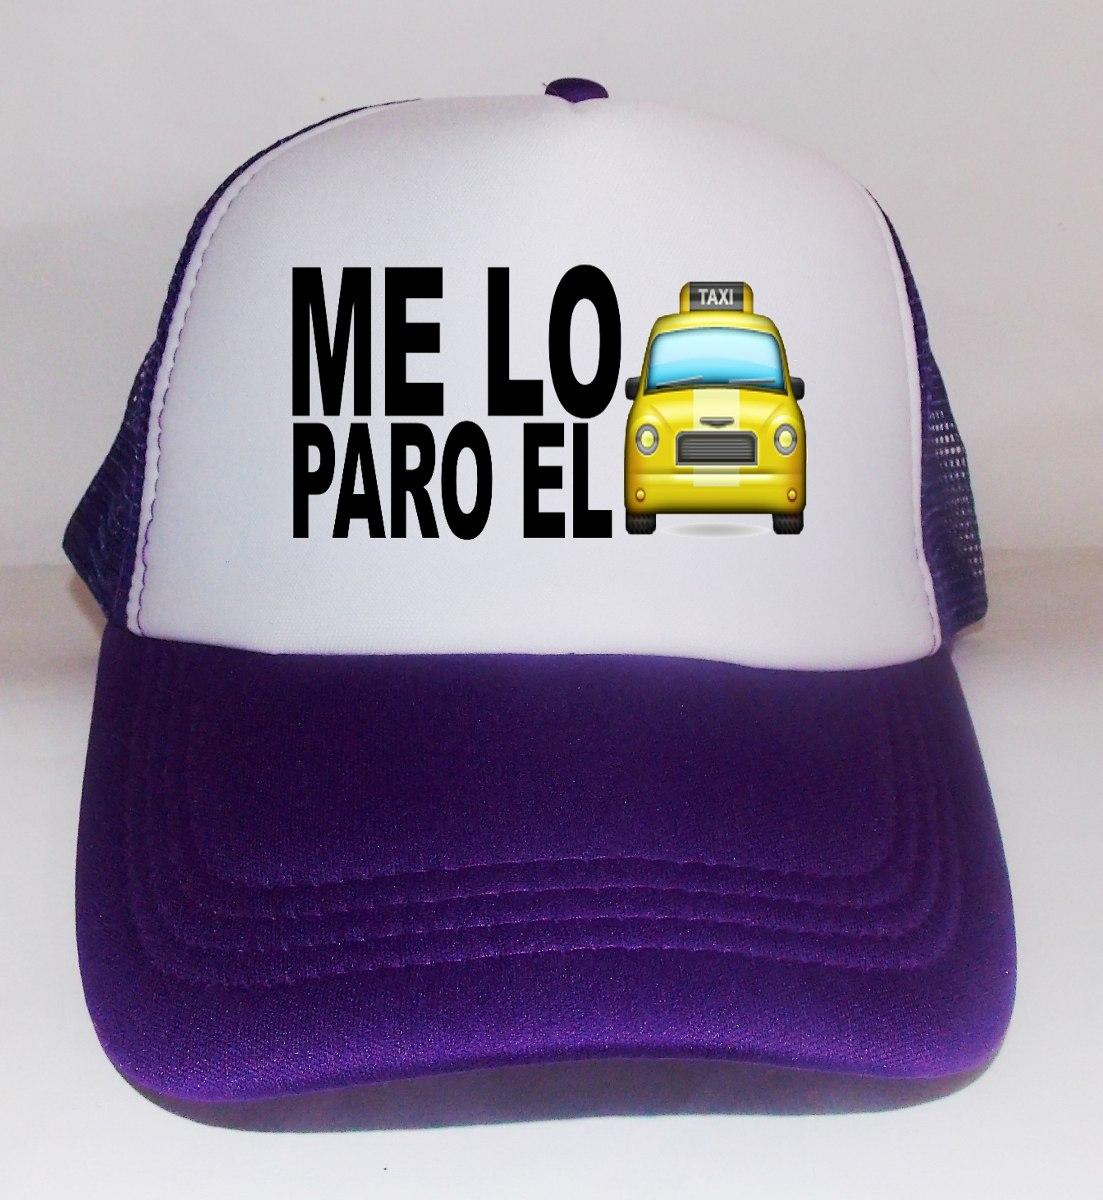 Paquete 5 Gorras Personalizadas Malla Fiesta Esponja Neon -   180.00 ... 6a47a32d89b